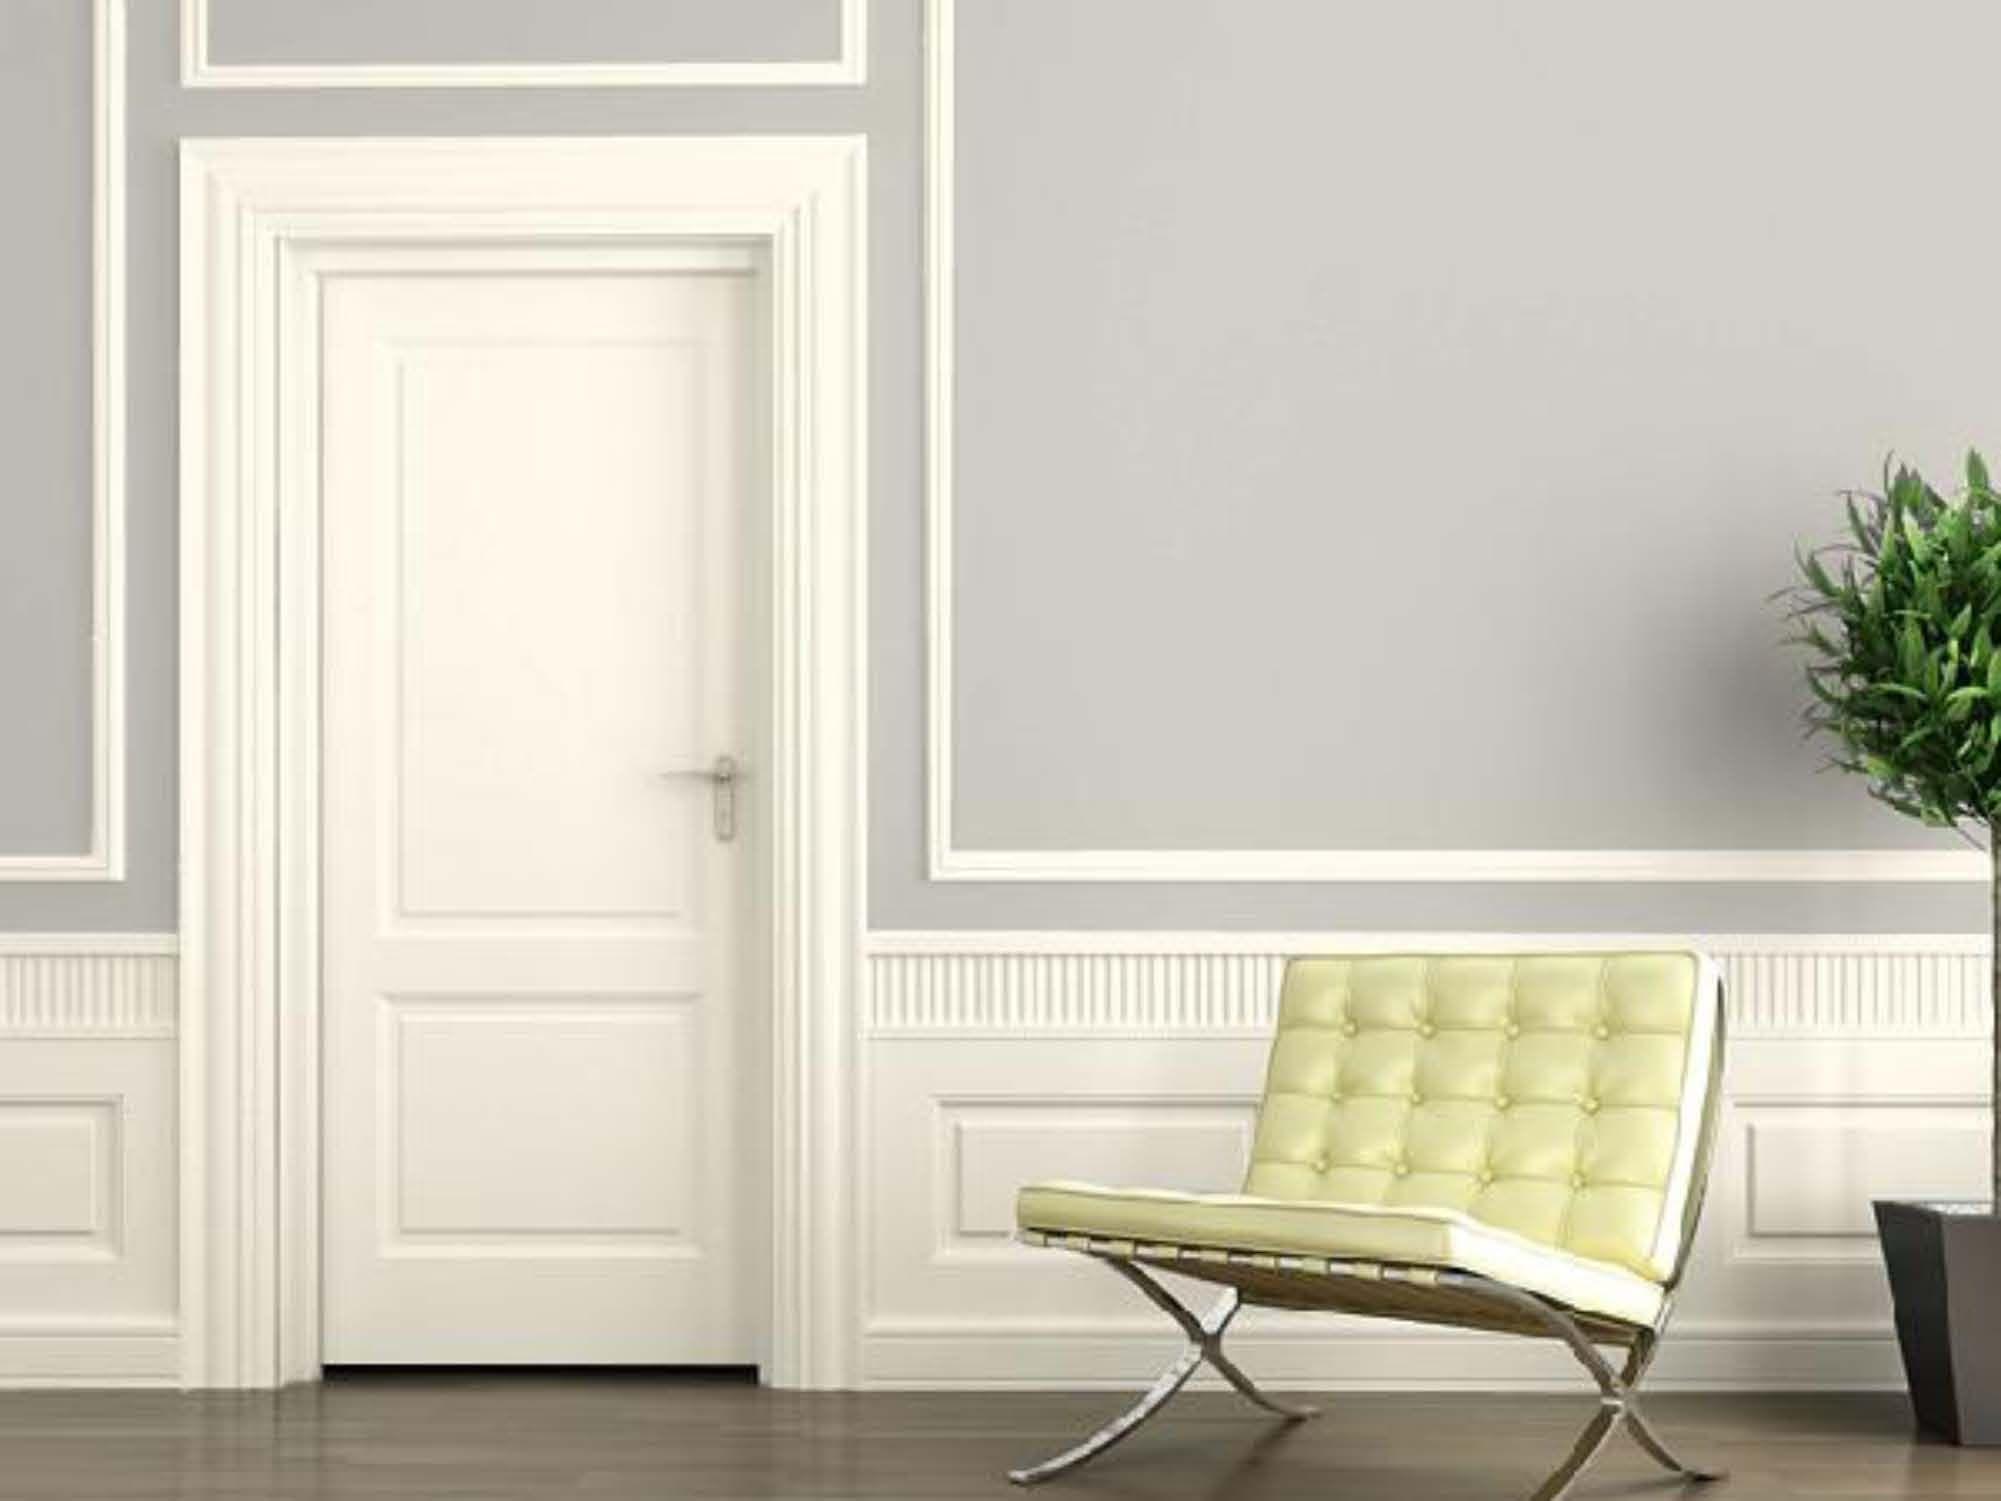 Loft Sherwin Williams Repose Gray Wall colors